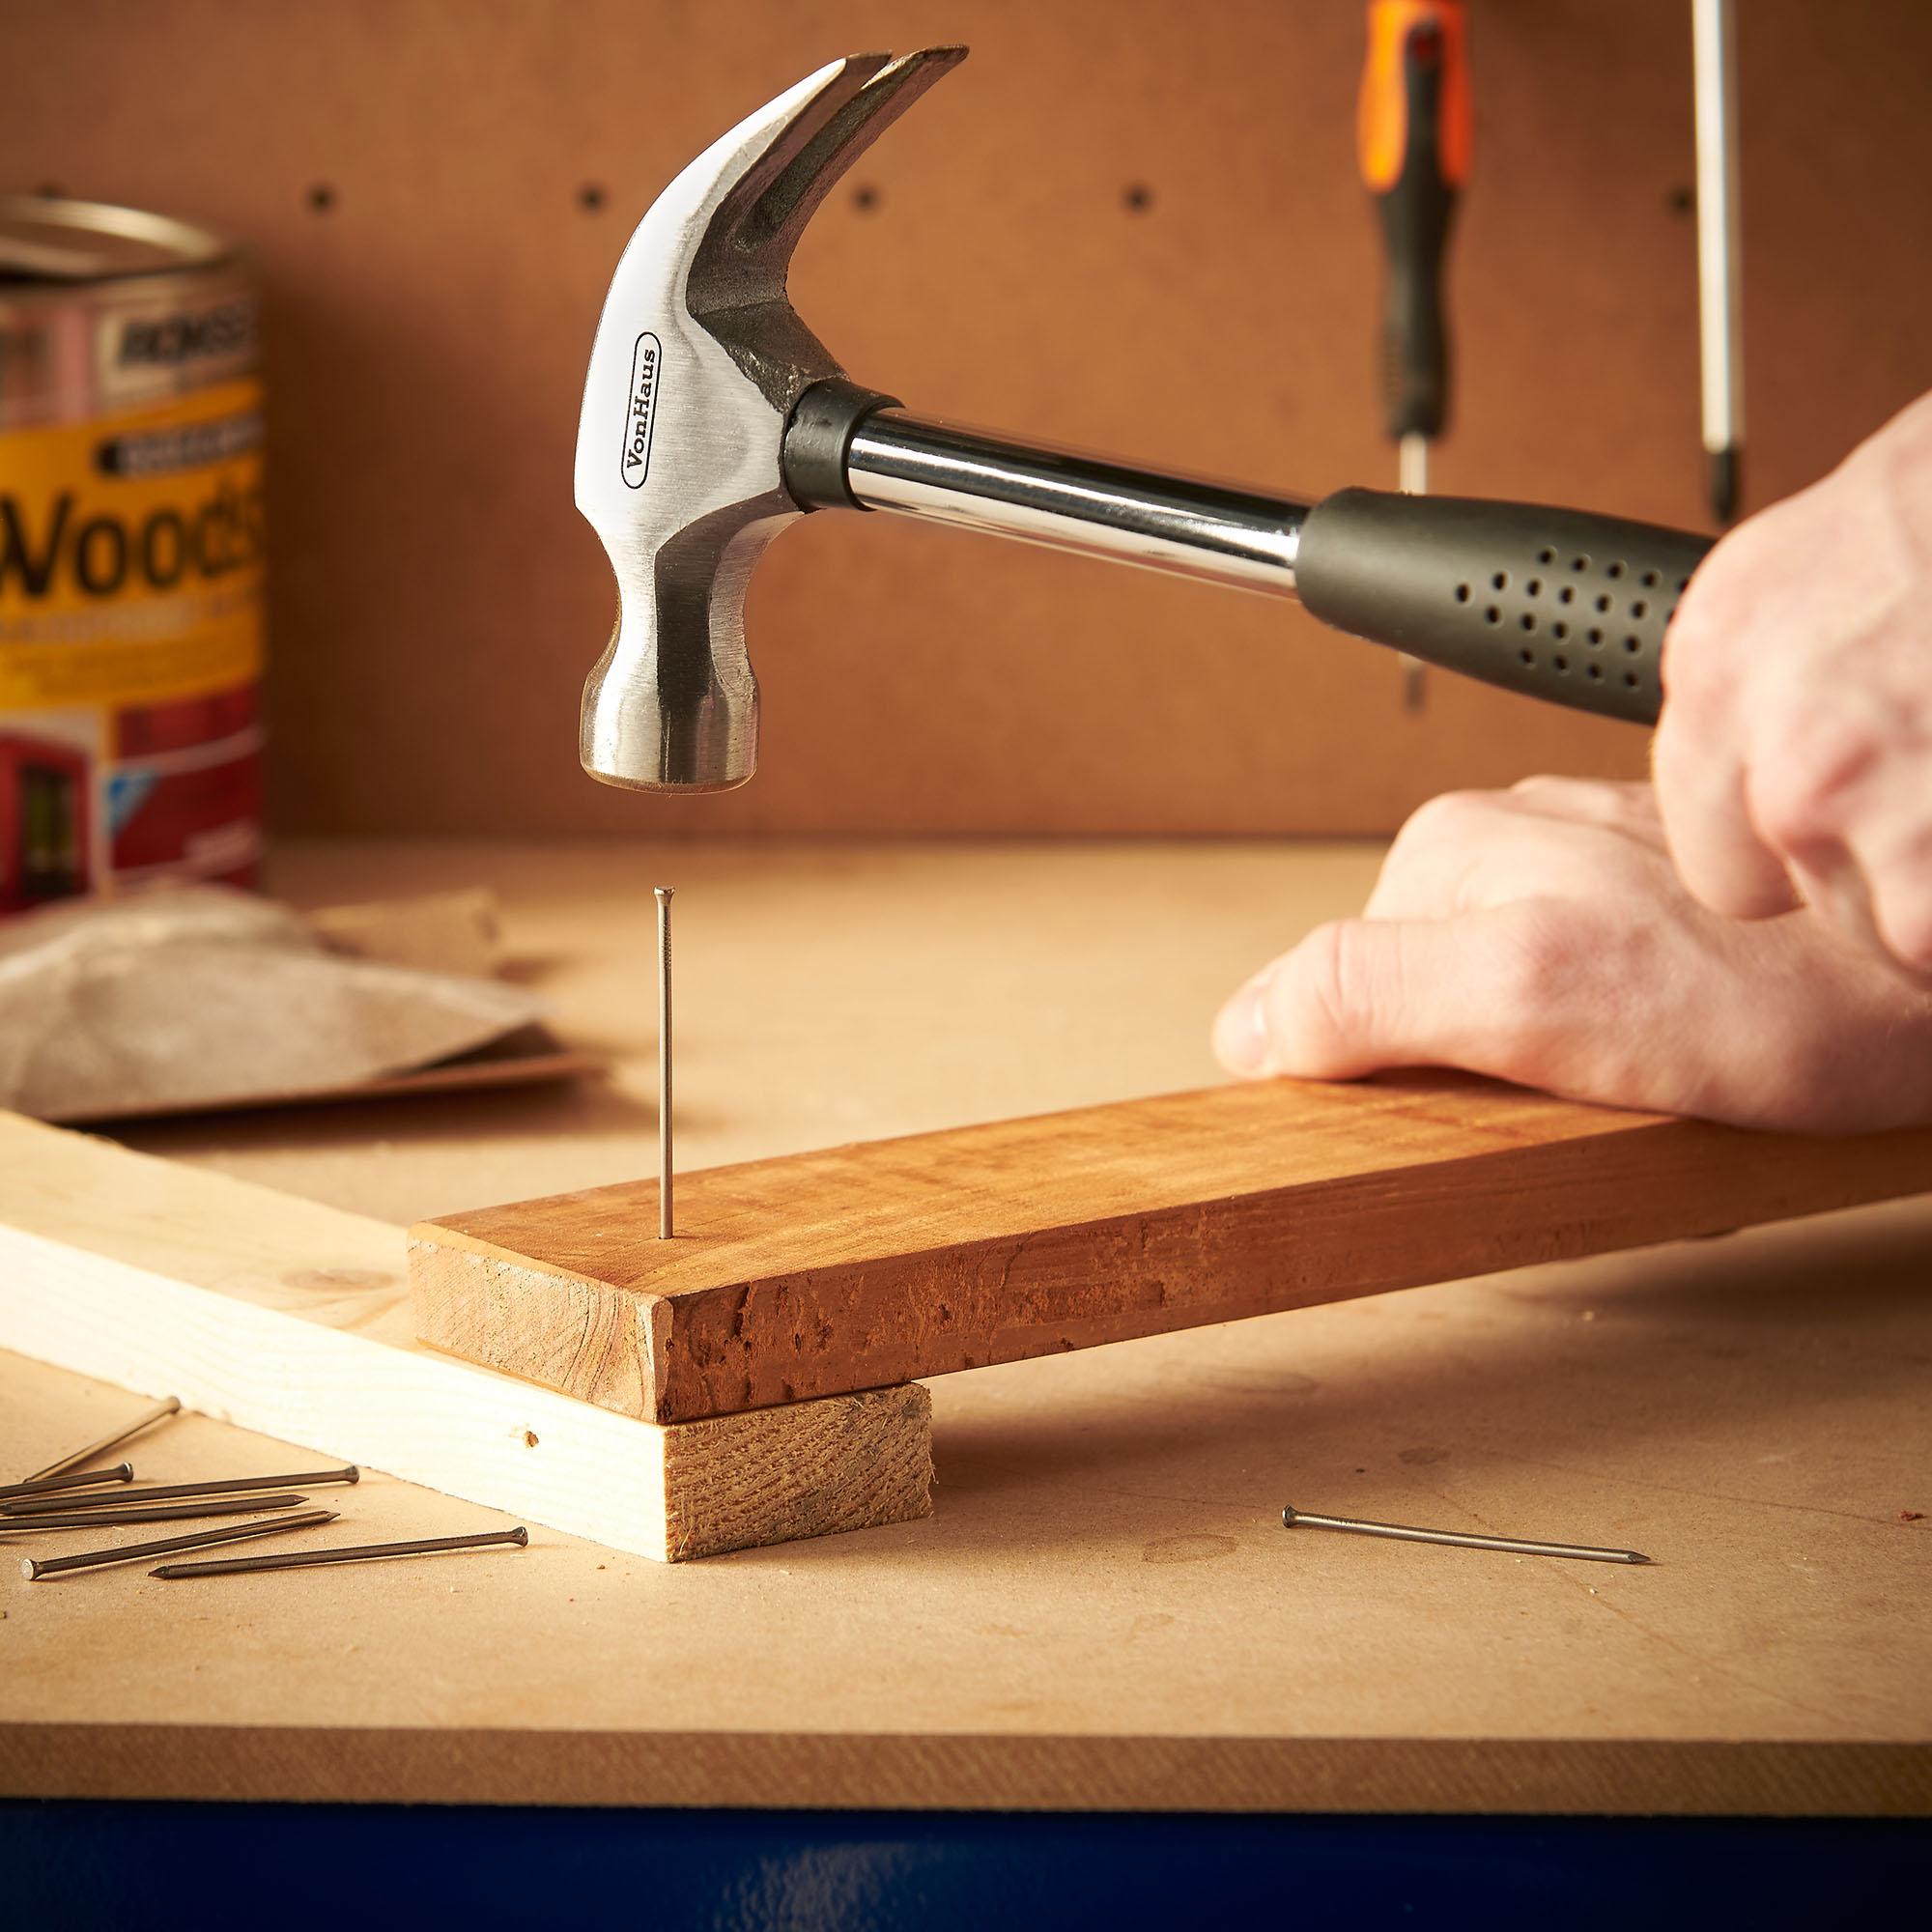 Vonhaus 92pc DIY Household Hand Tool Kit Set with Tool Organiser ...